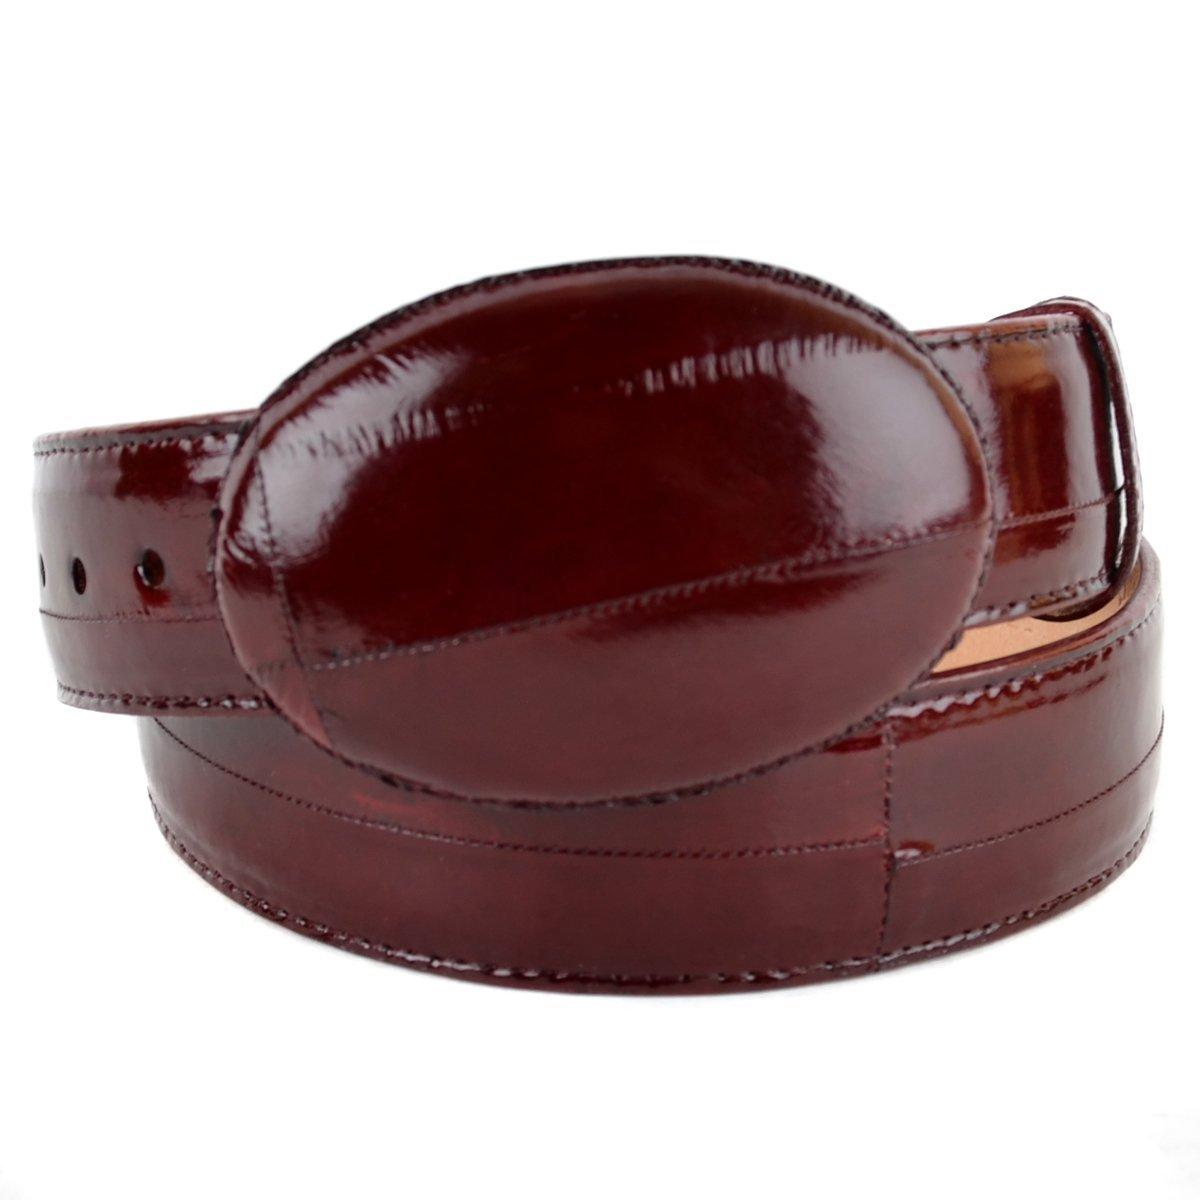 Original Burgundy Eel Skin Western Style Belt